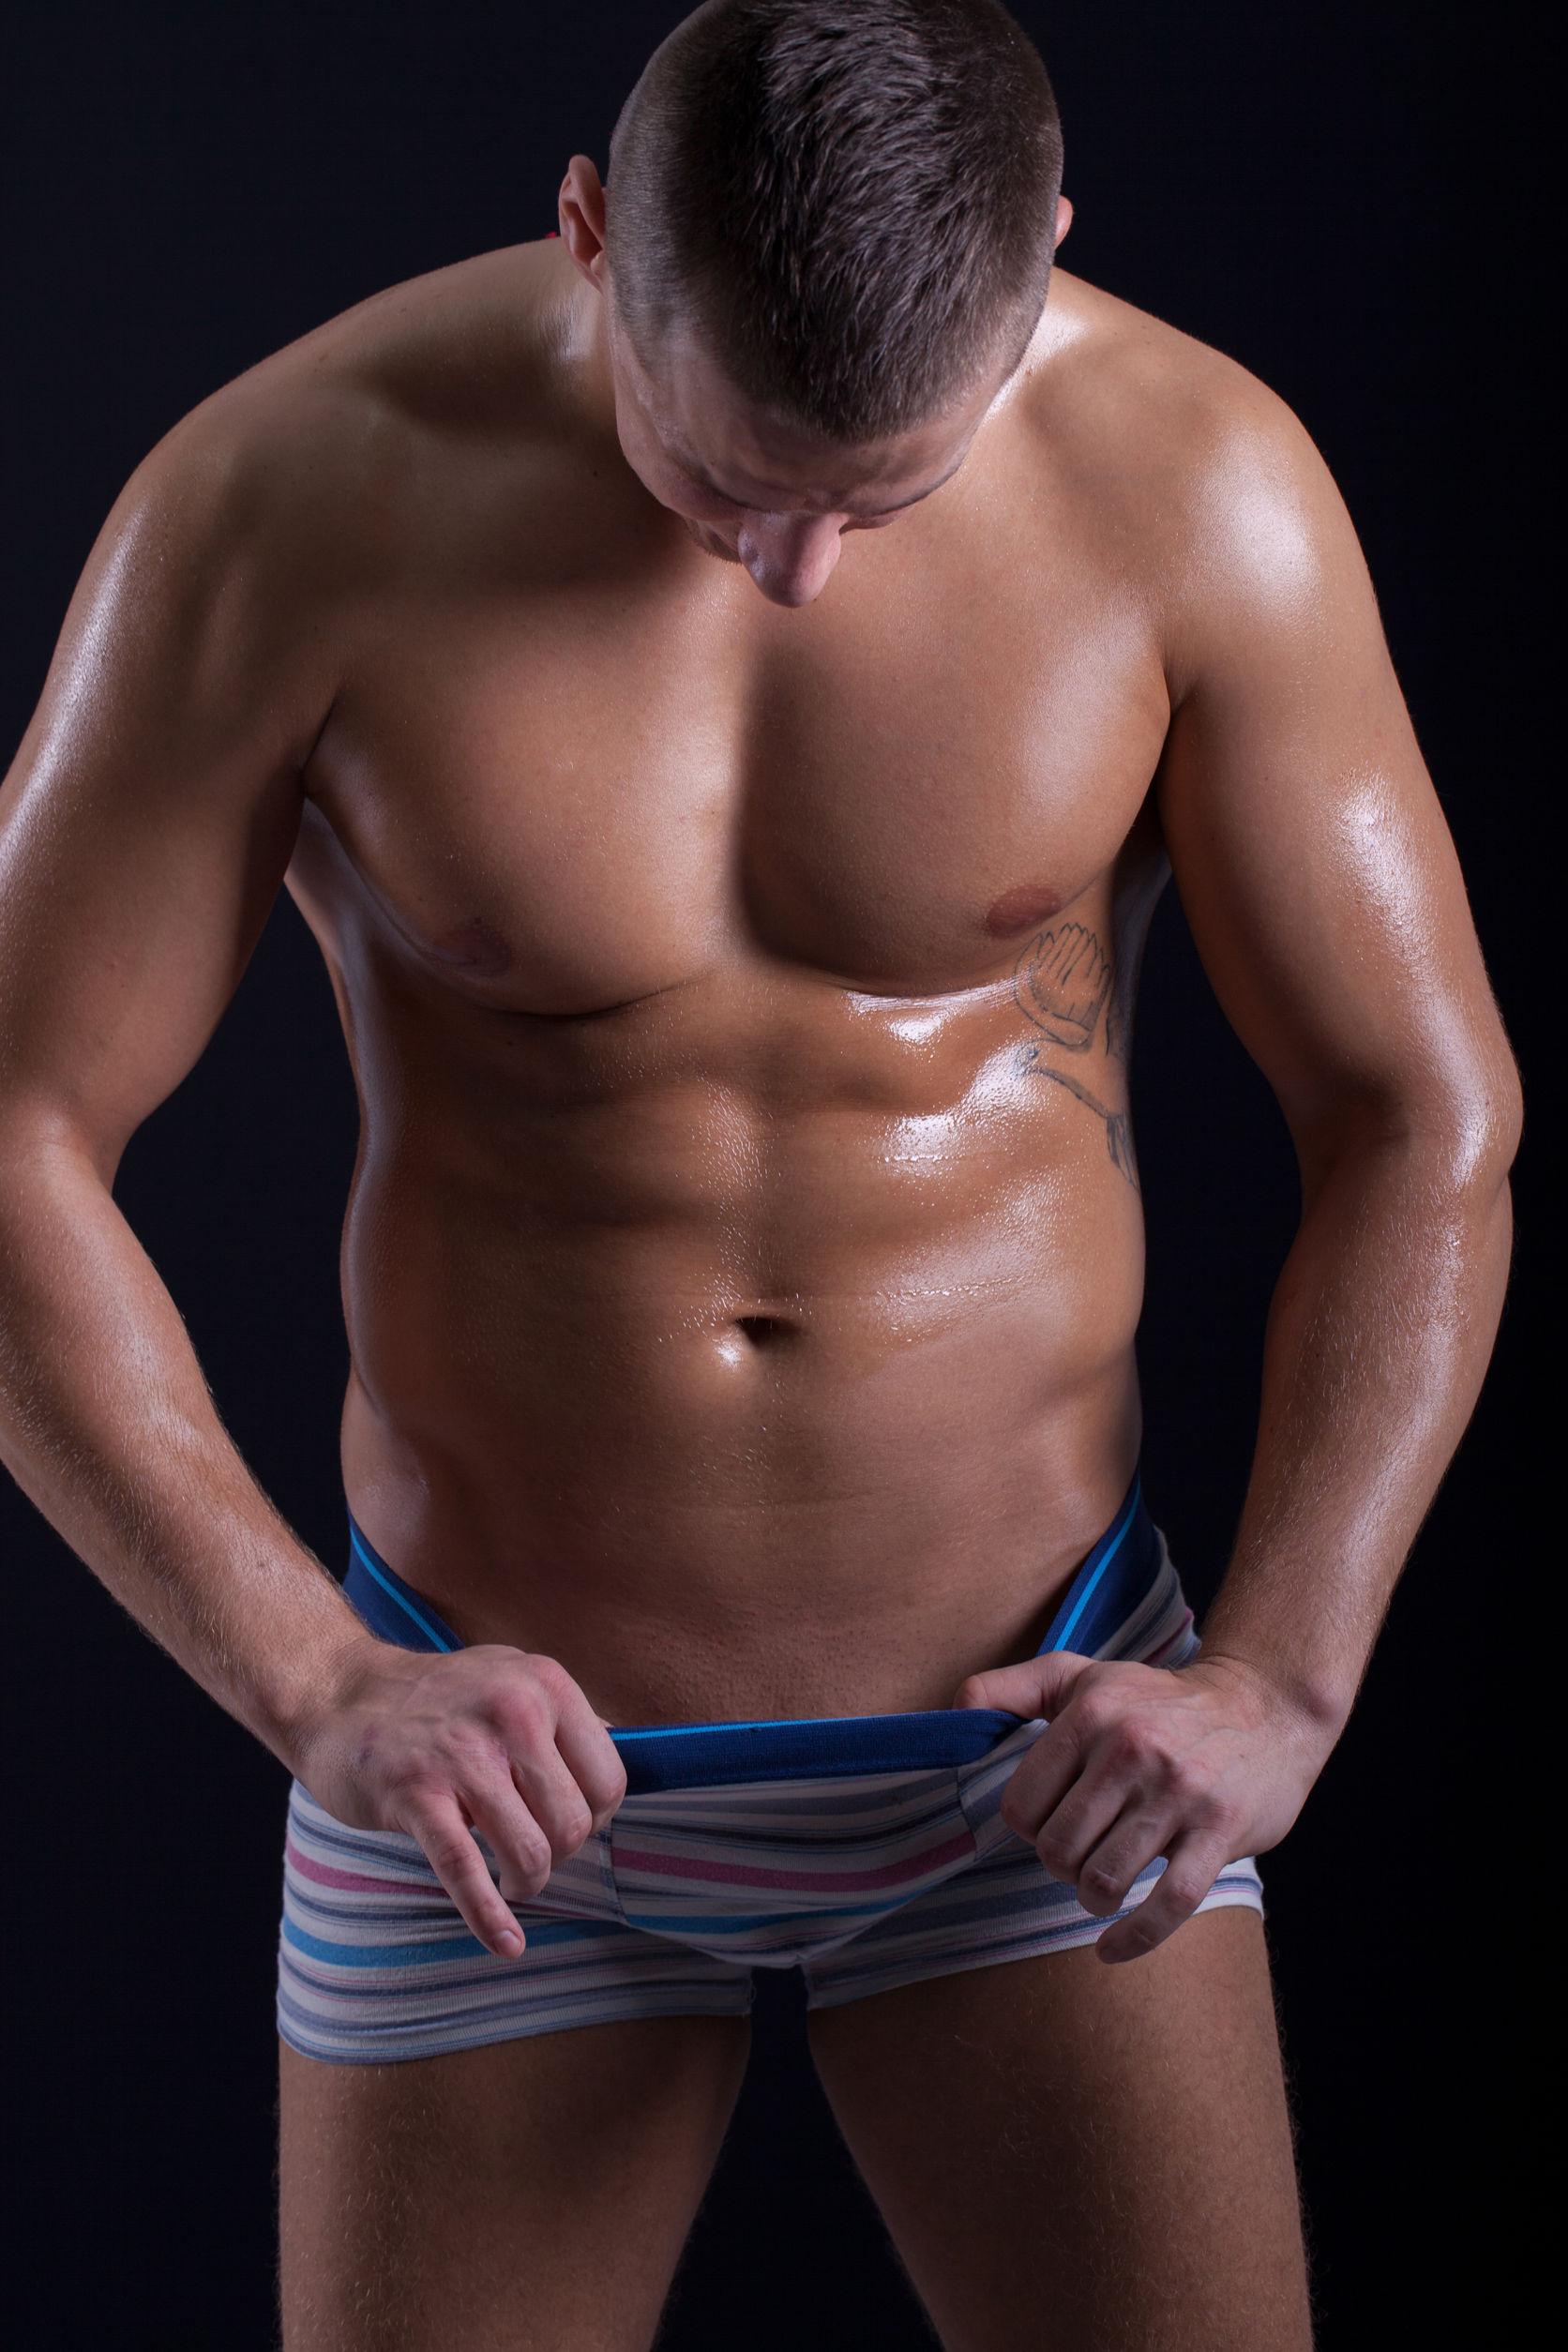 28703523 - muscular  man looking down in his pants